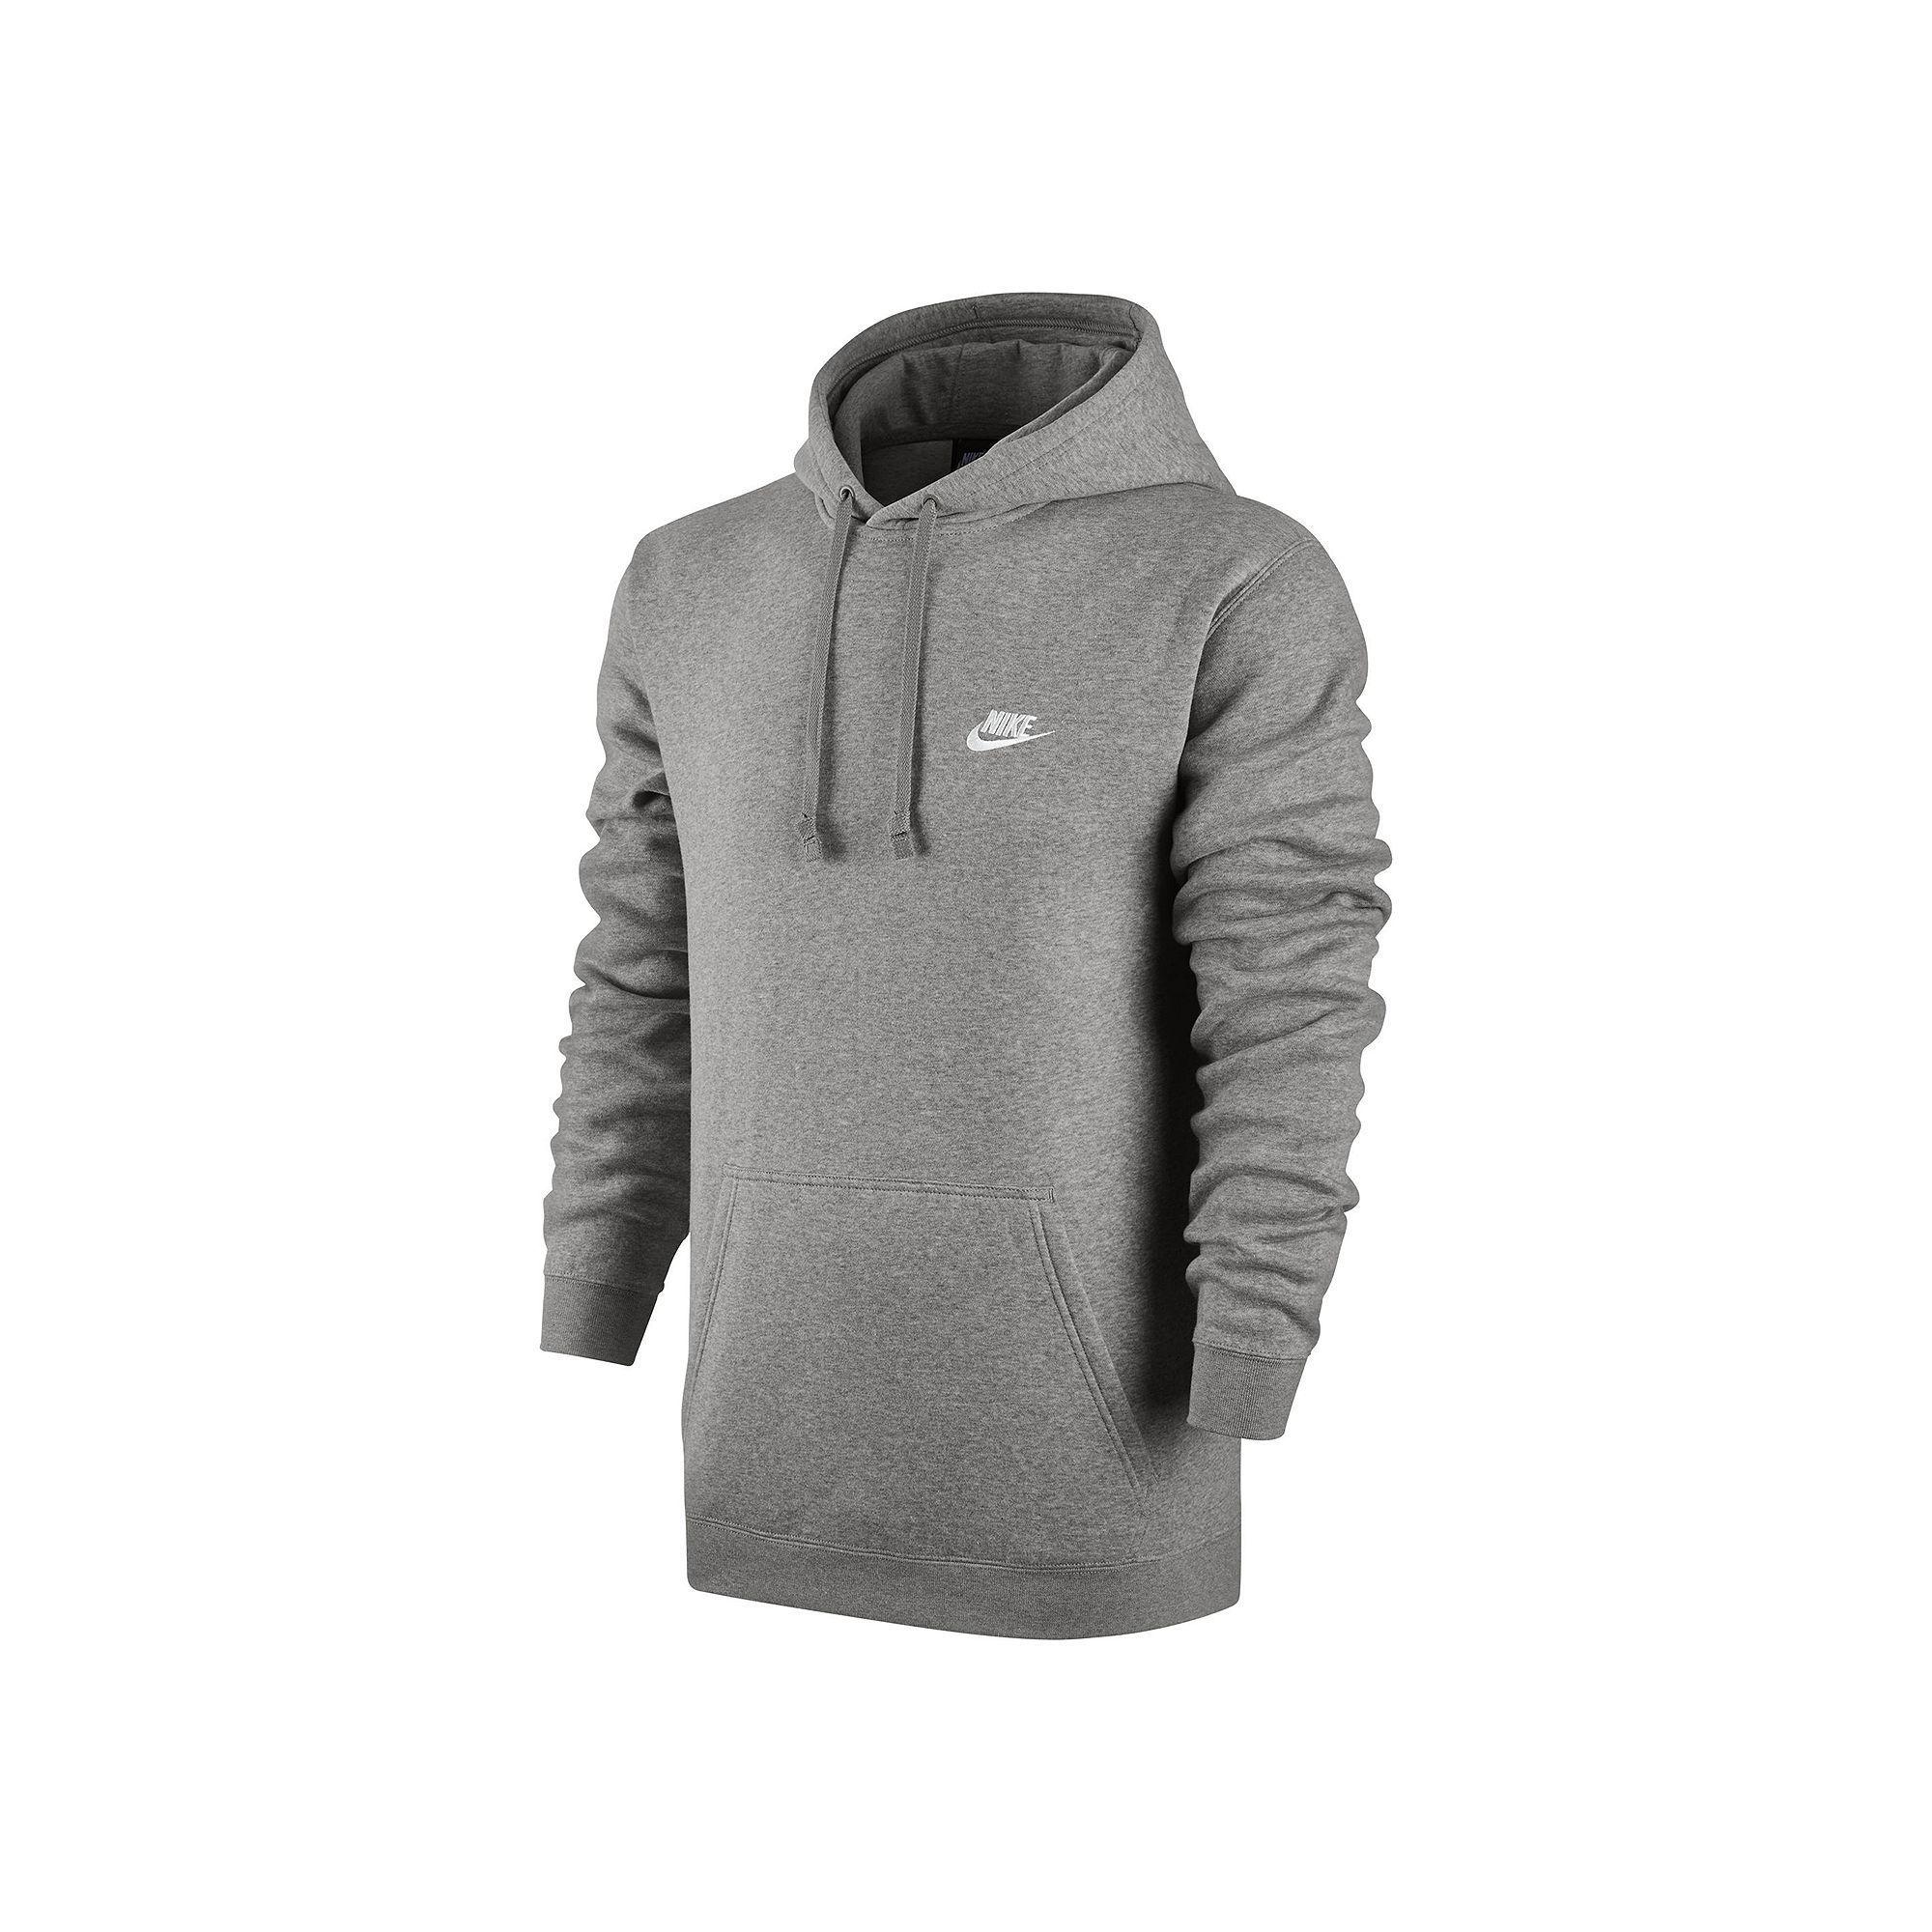 Nike Taille Hoodies Mens 3x